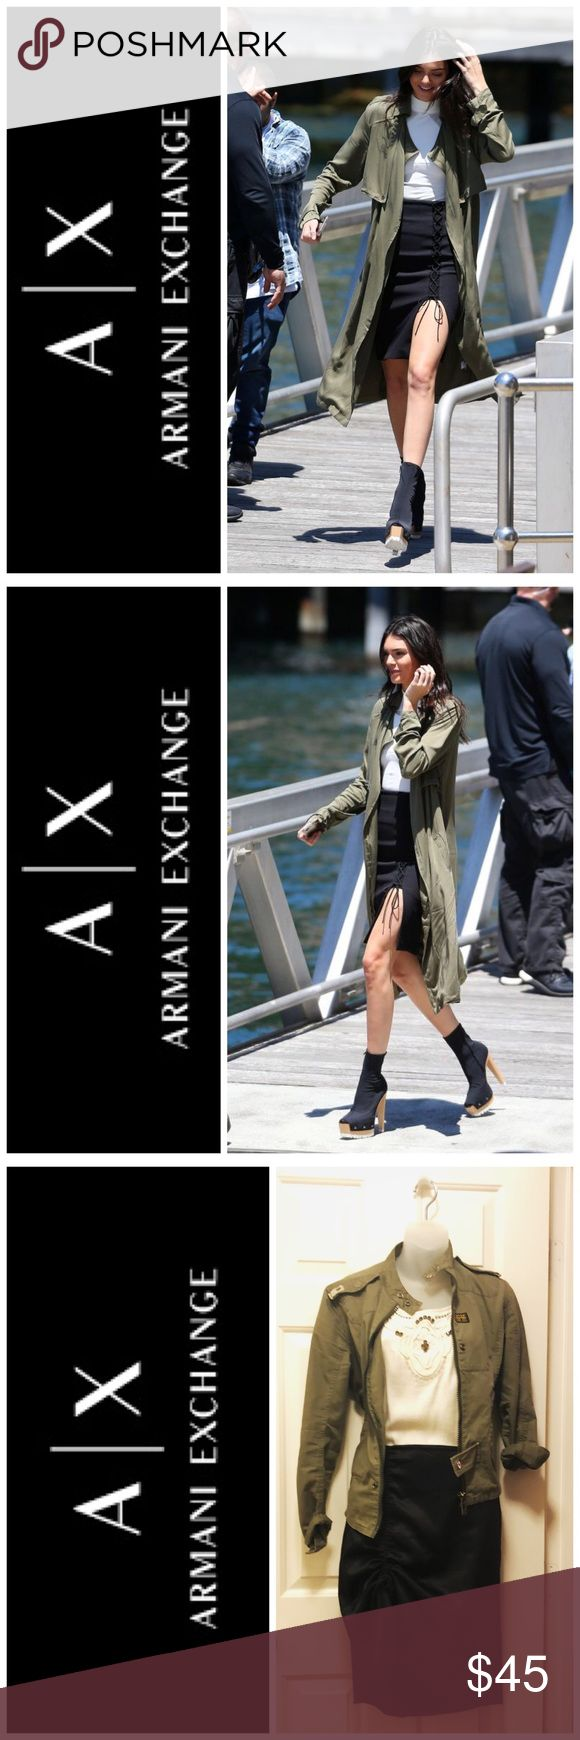 Armani Exchange Black Skirt P0. Get the look! Armani Exchange Black Skirt P0. Get the look! A/X Armani Exchange Skirts Pencil